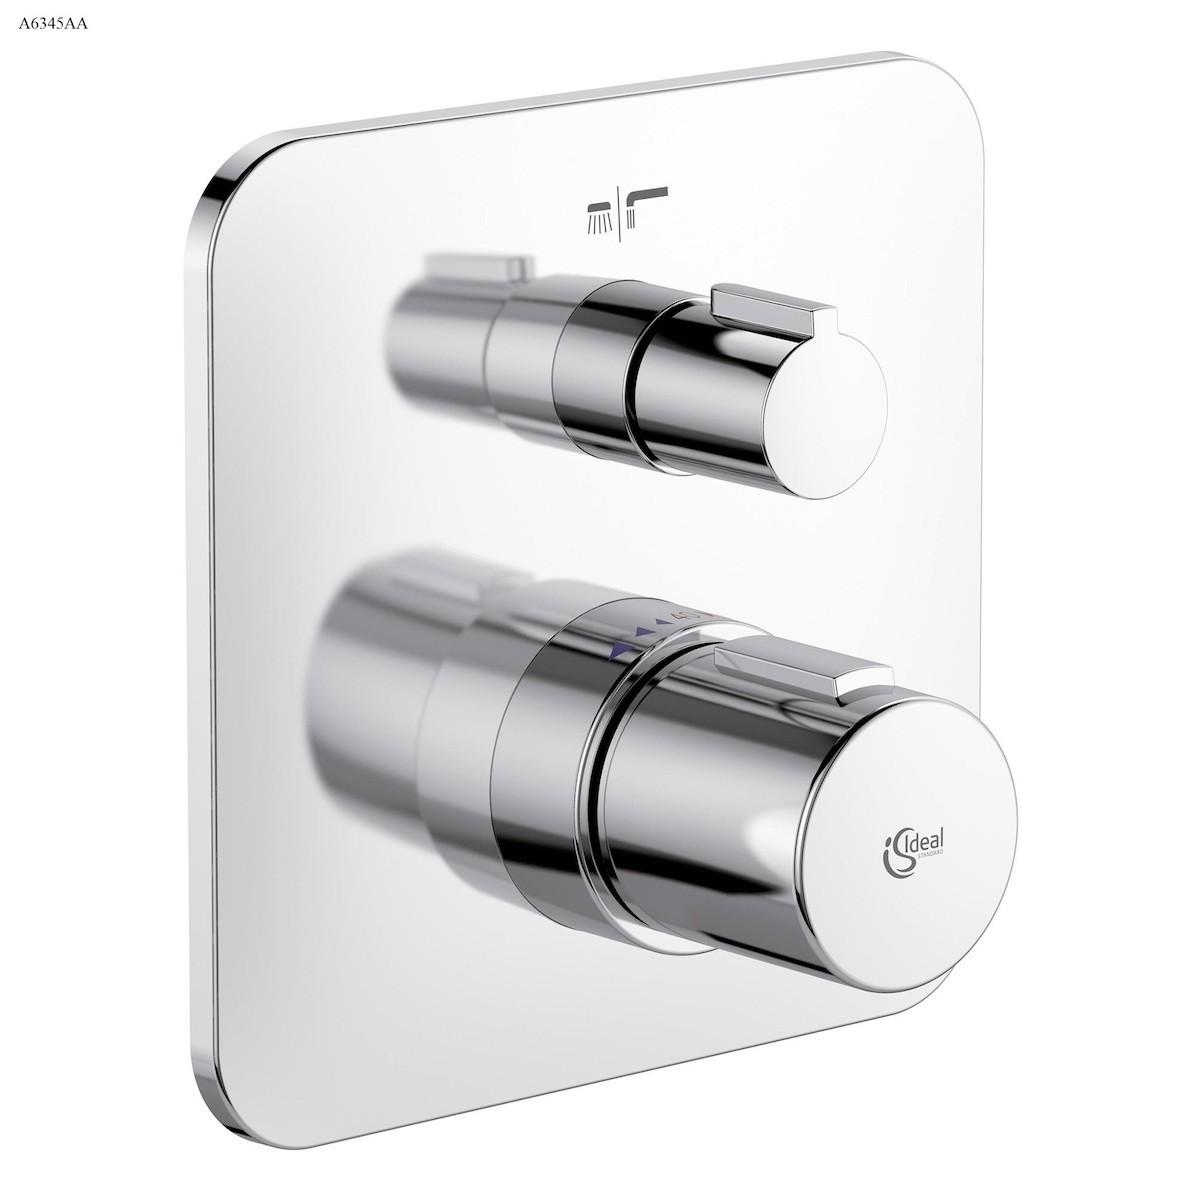 Tonic II vanový termostat podom, dil 2 A6345AA - Ideal Standard Tonic II A6345AA